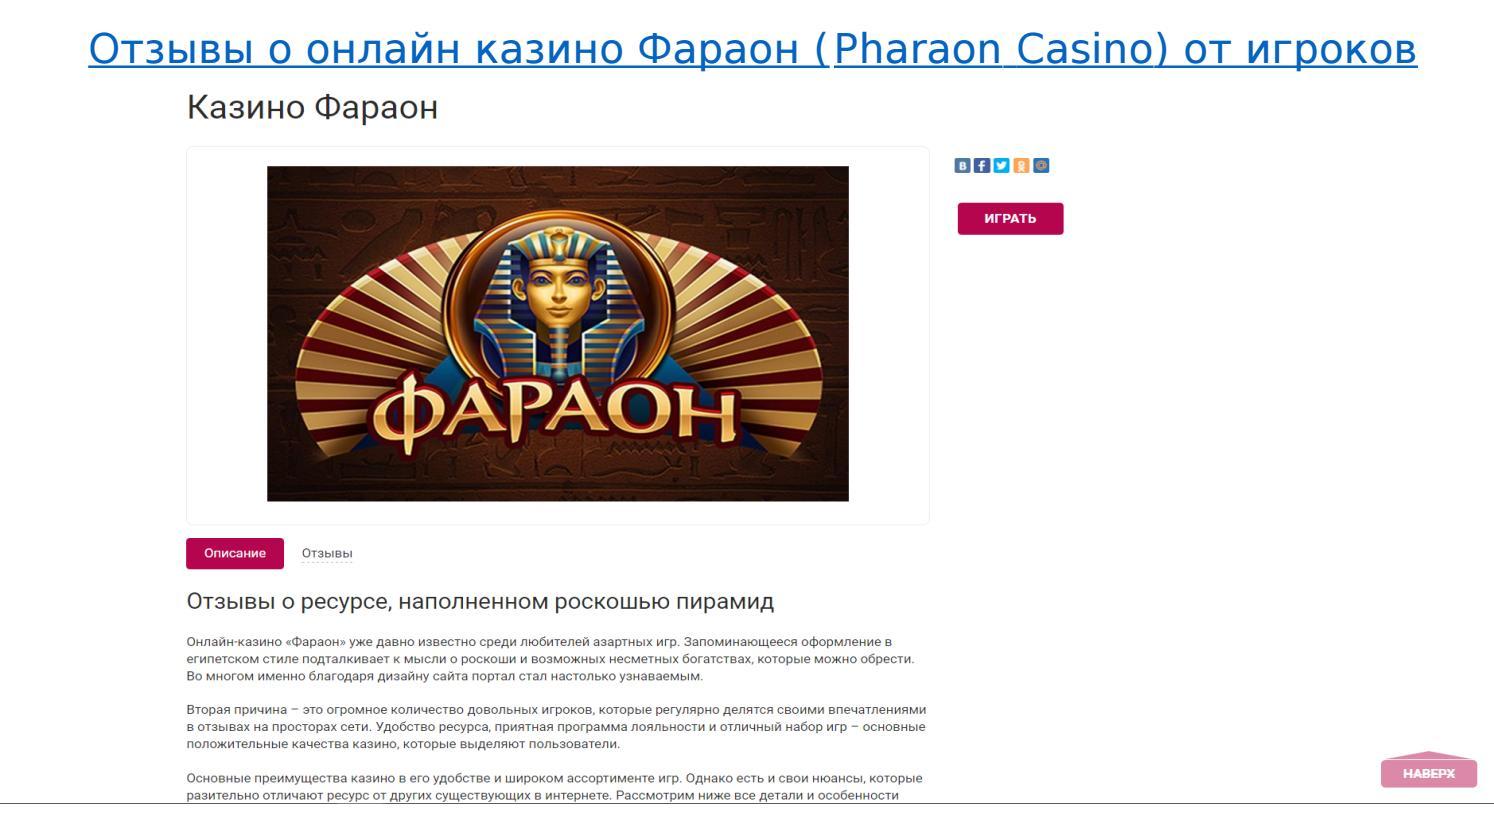 Отзывы об казино онлайн фараон покер онлайн на симбиан скачать